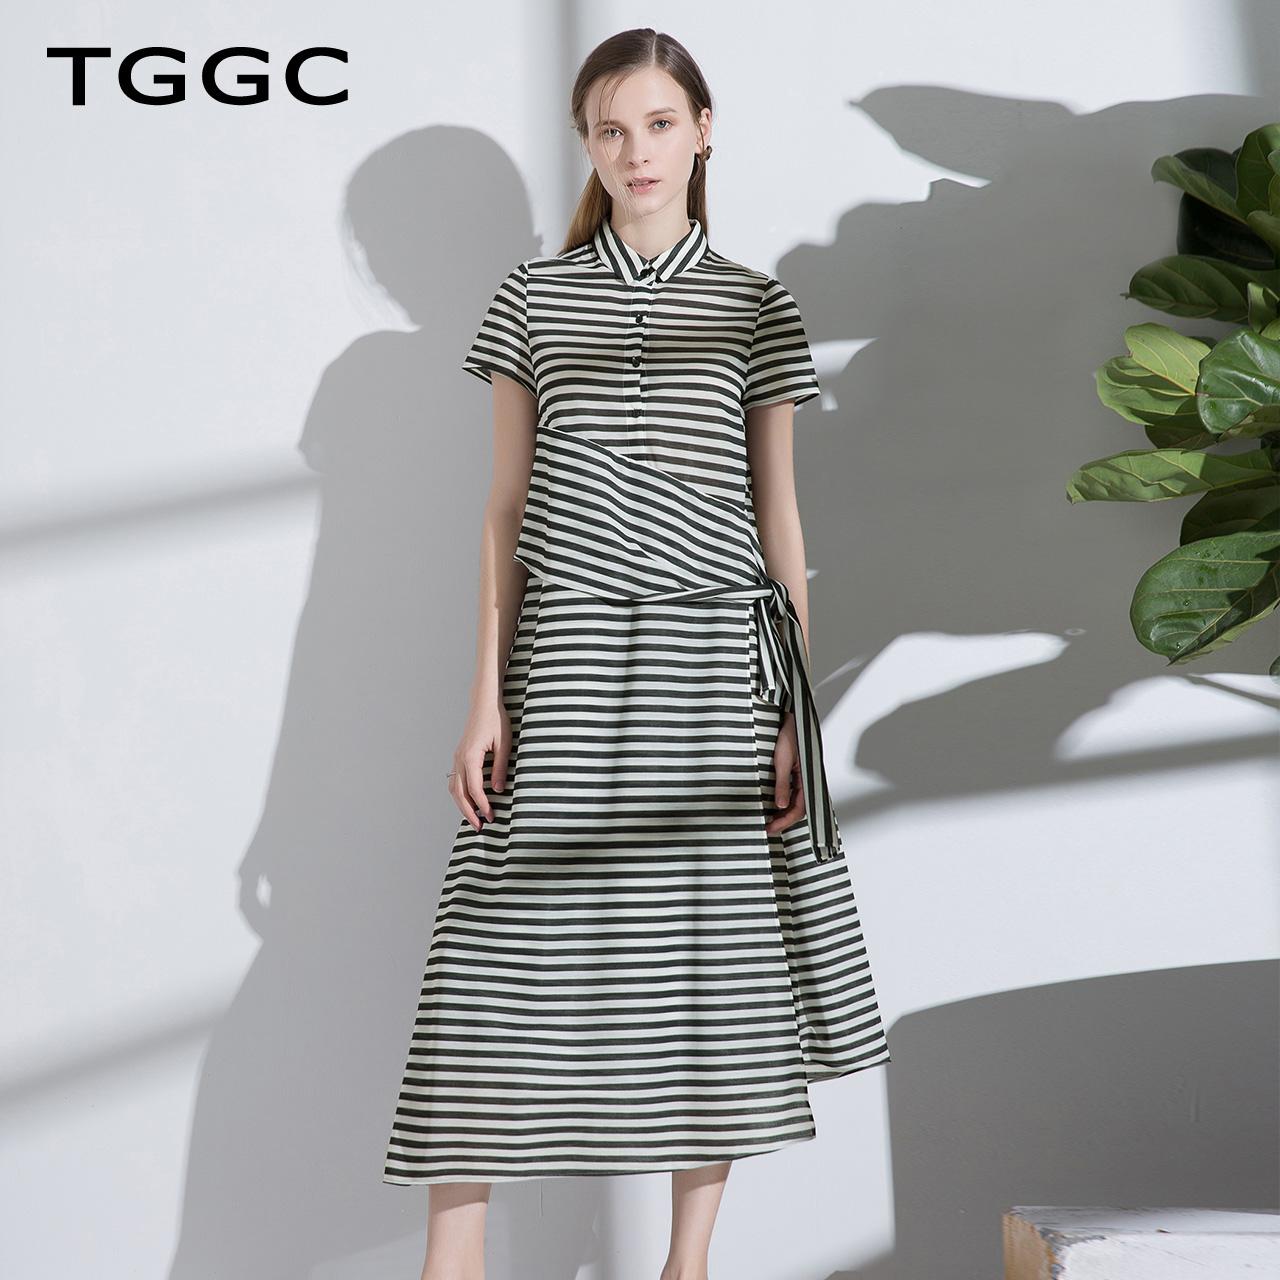 TGGC2018年夏装新款通勤长款衬衫裙宽松显瘦条纹拼接连衣裙F22575